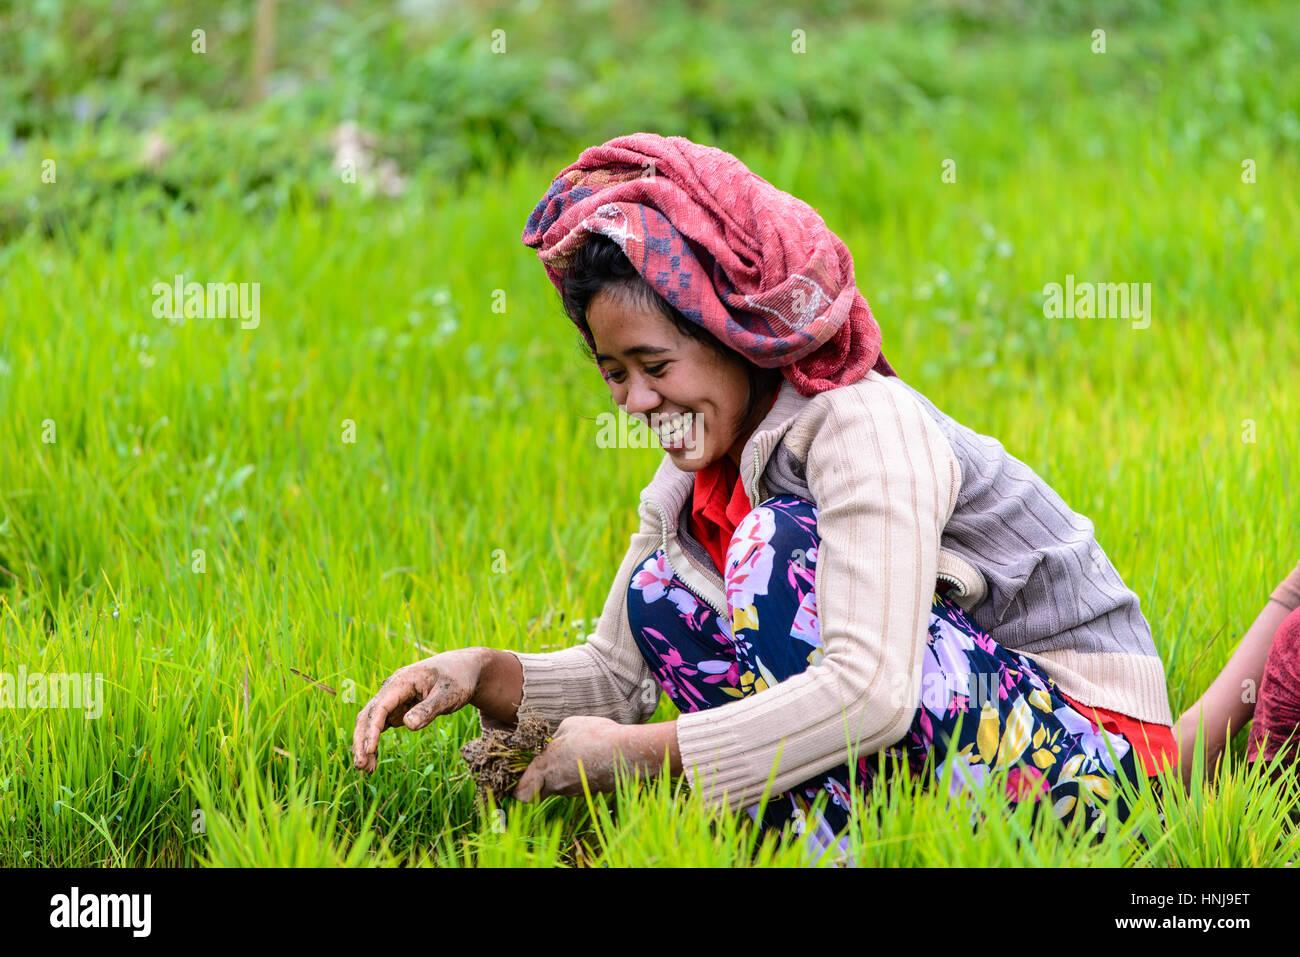 TETEBATU, INDONESIA - SEPTEMBER 10, 2014: Indonesian farmer planting rice saplings - Stock Image